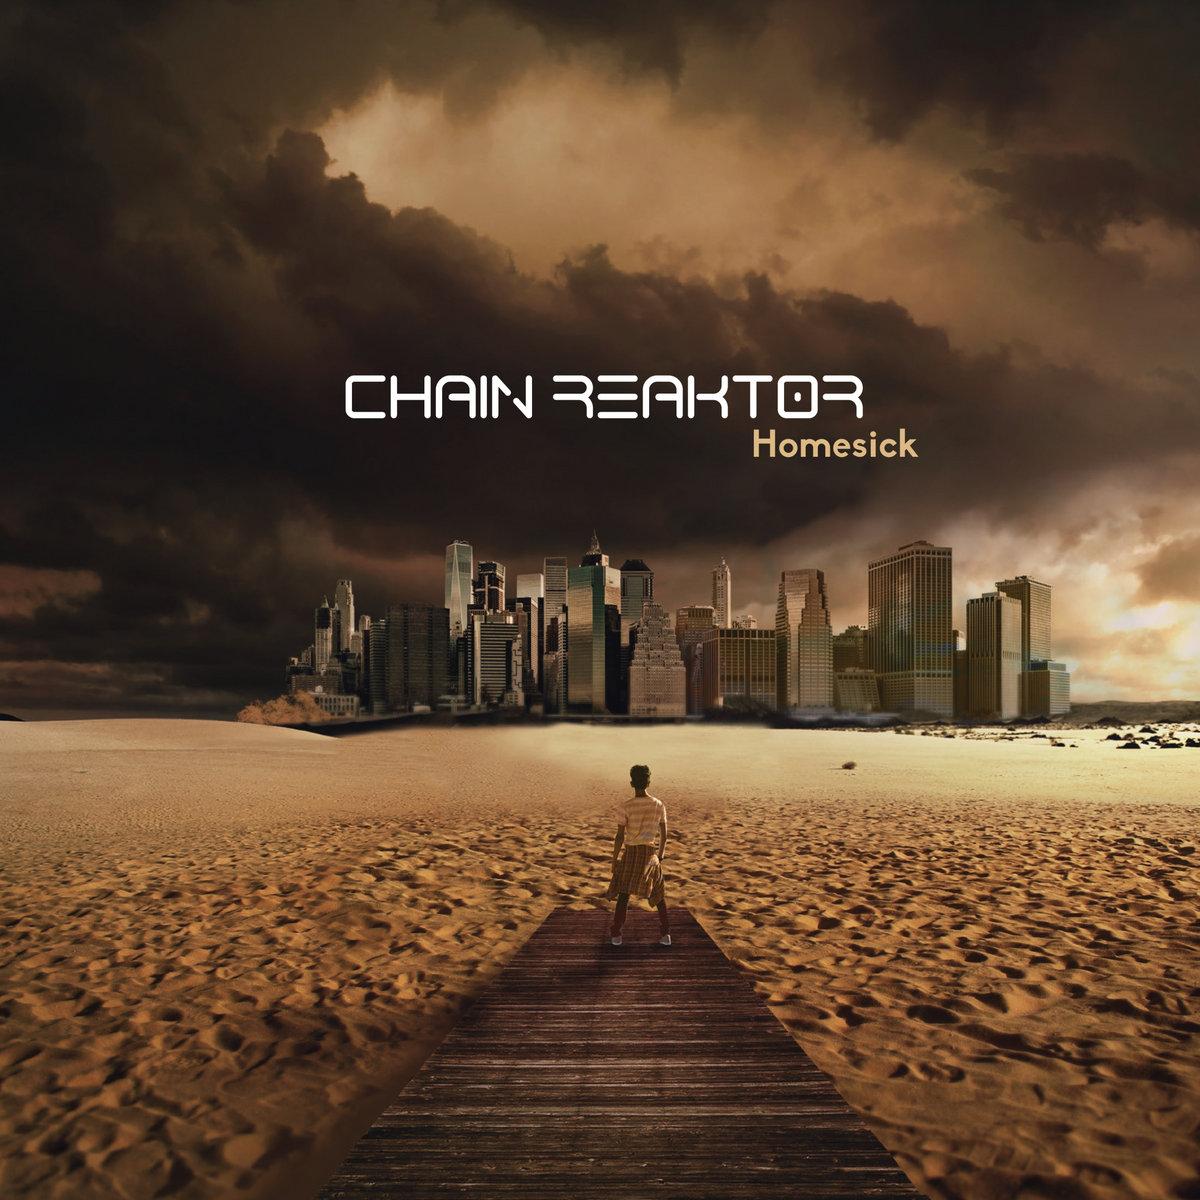 Chain Reaktor - Homesick